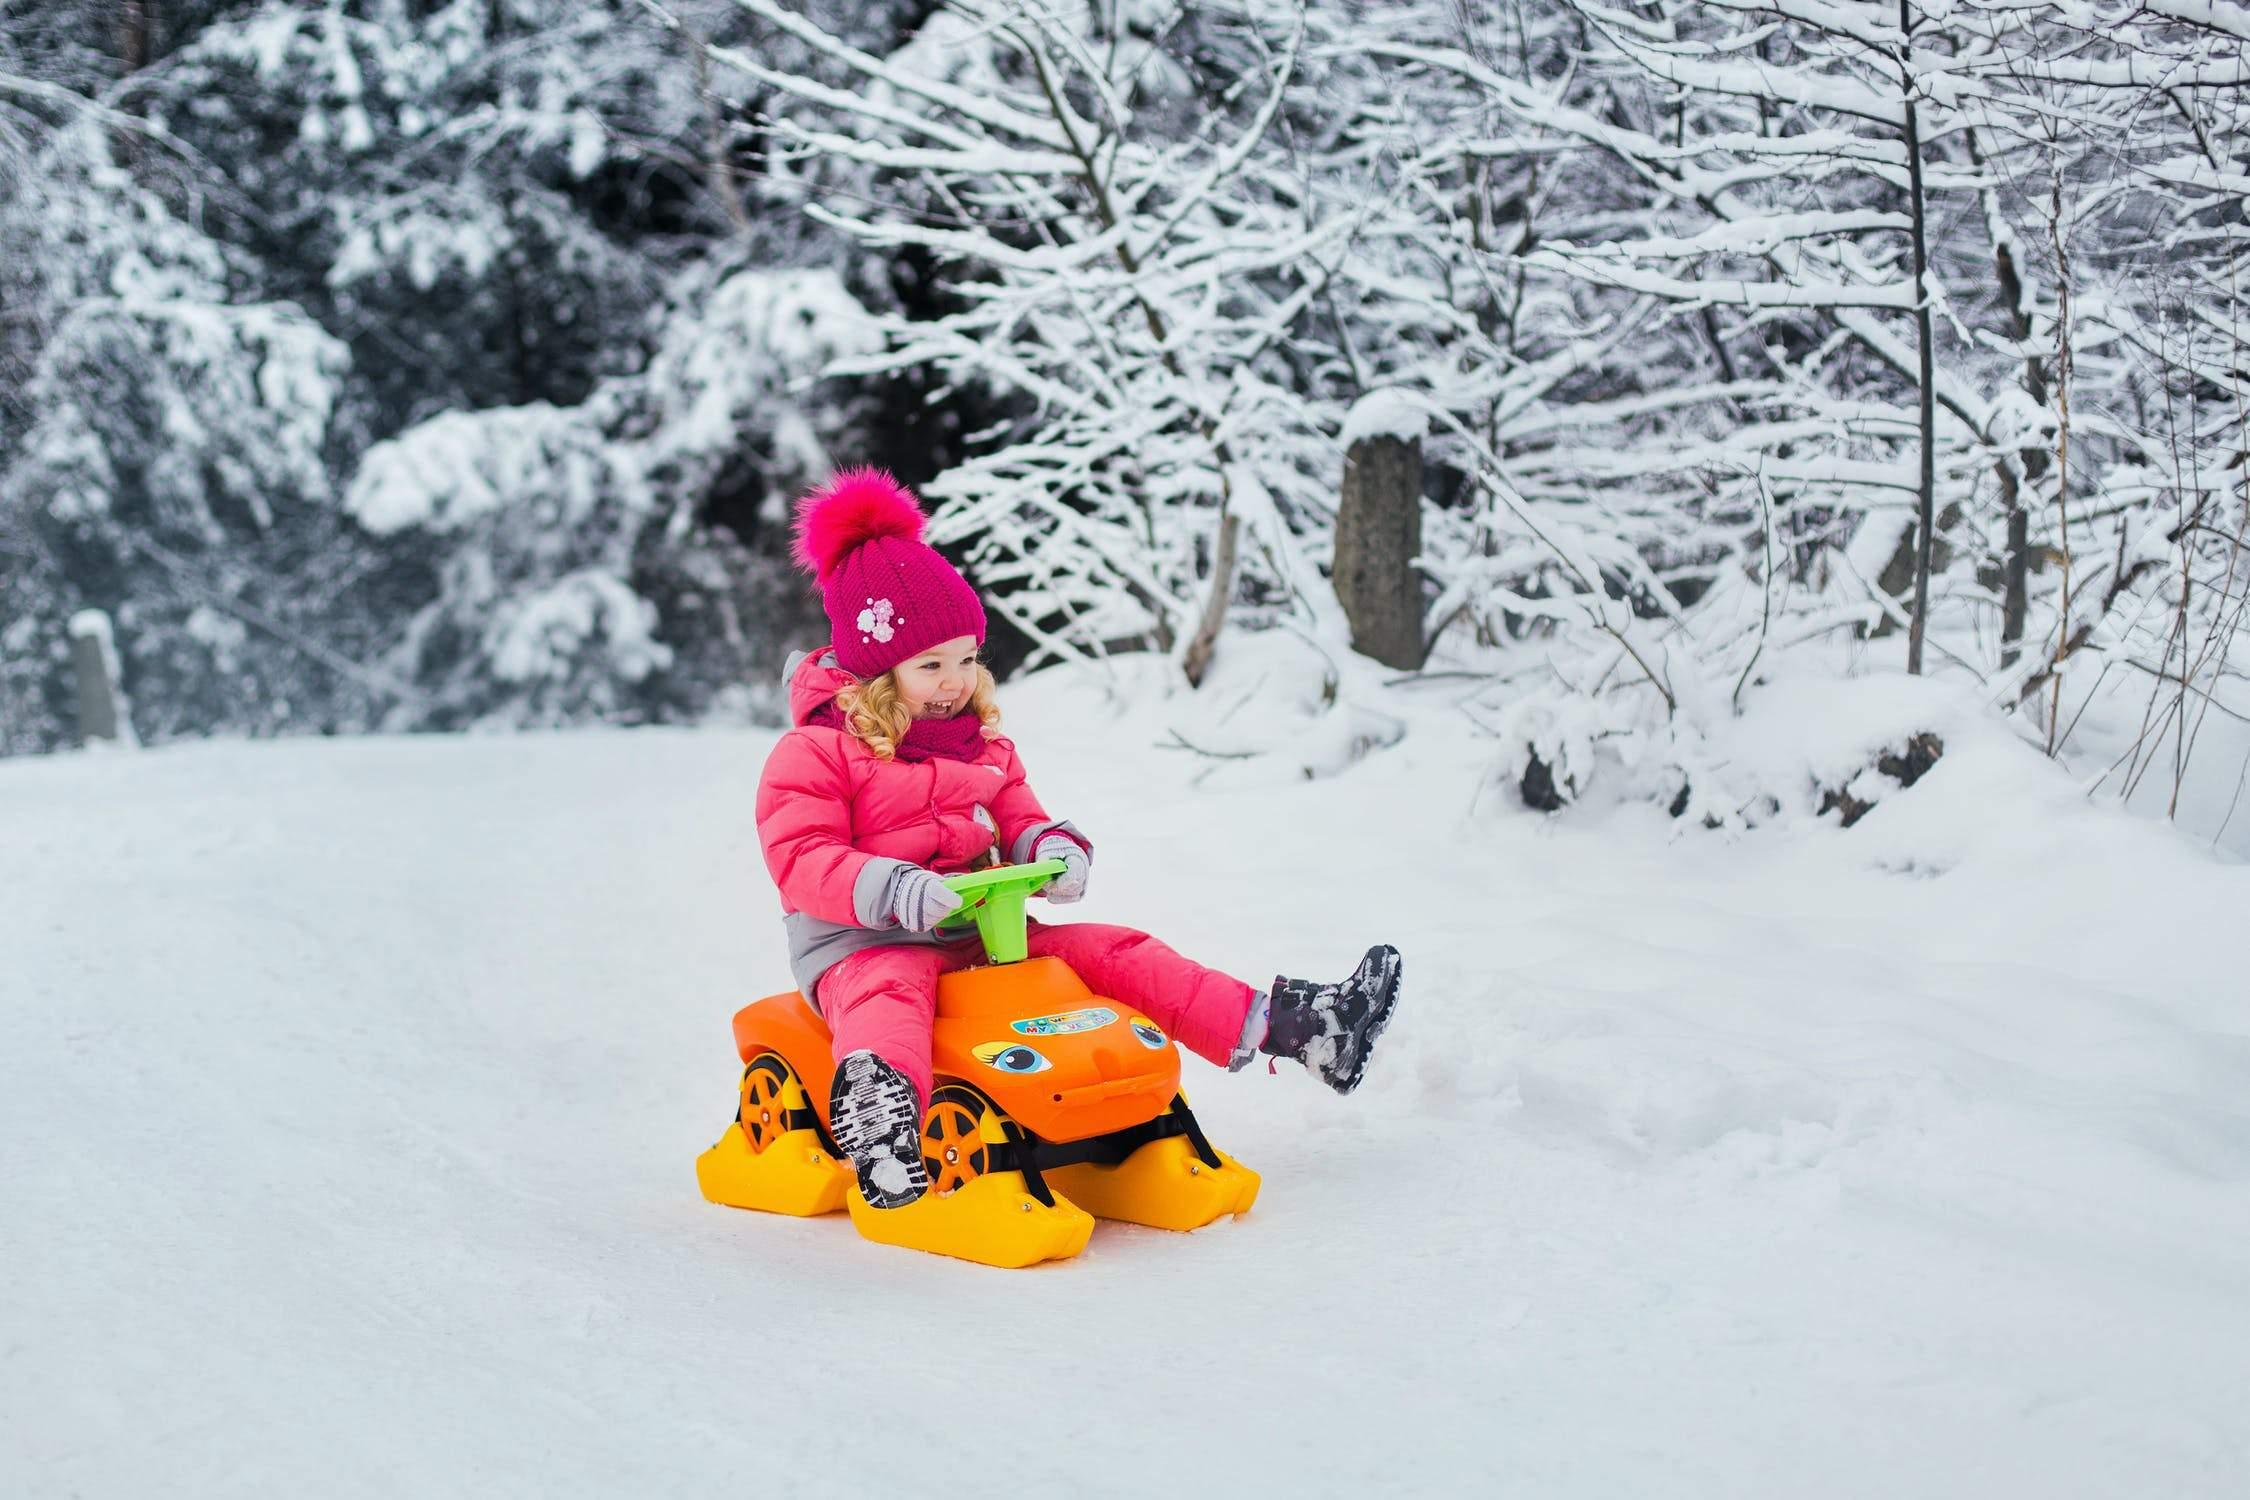 snow, winter fun, holiday season